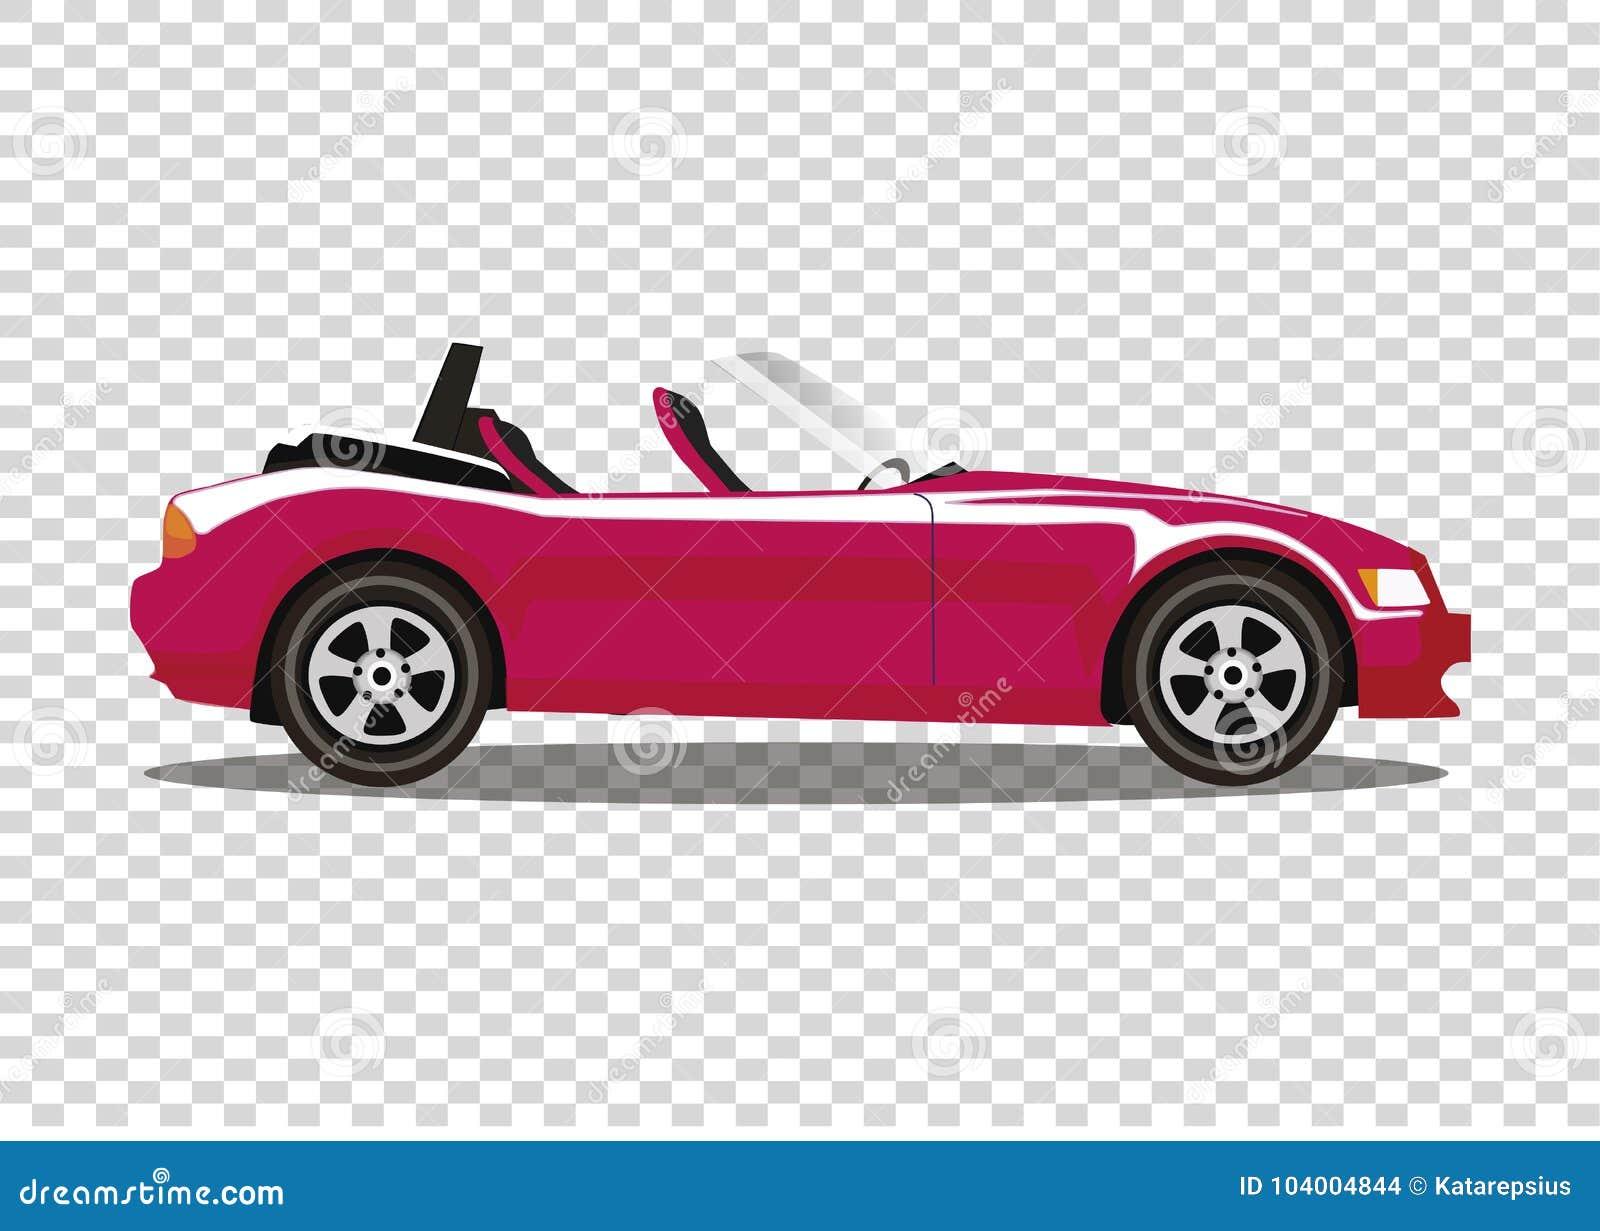 Voiture De Cabriolet Coloree Par Bande Dessinee Moderne Rouge D